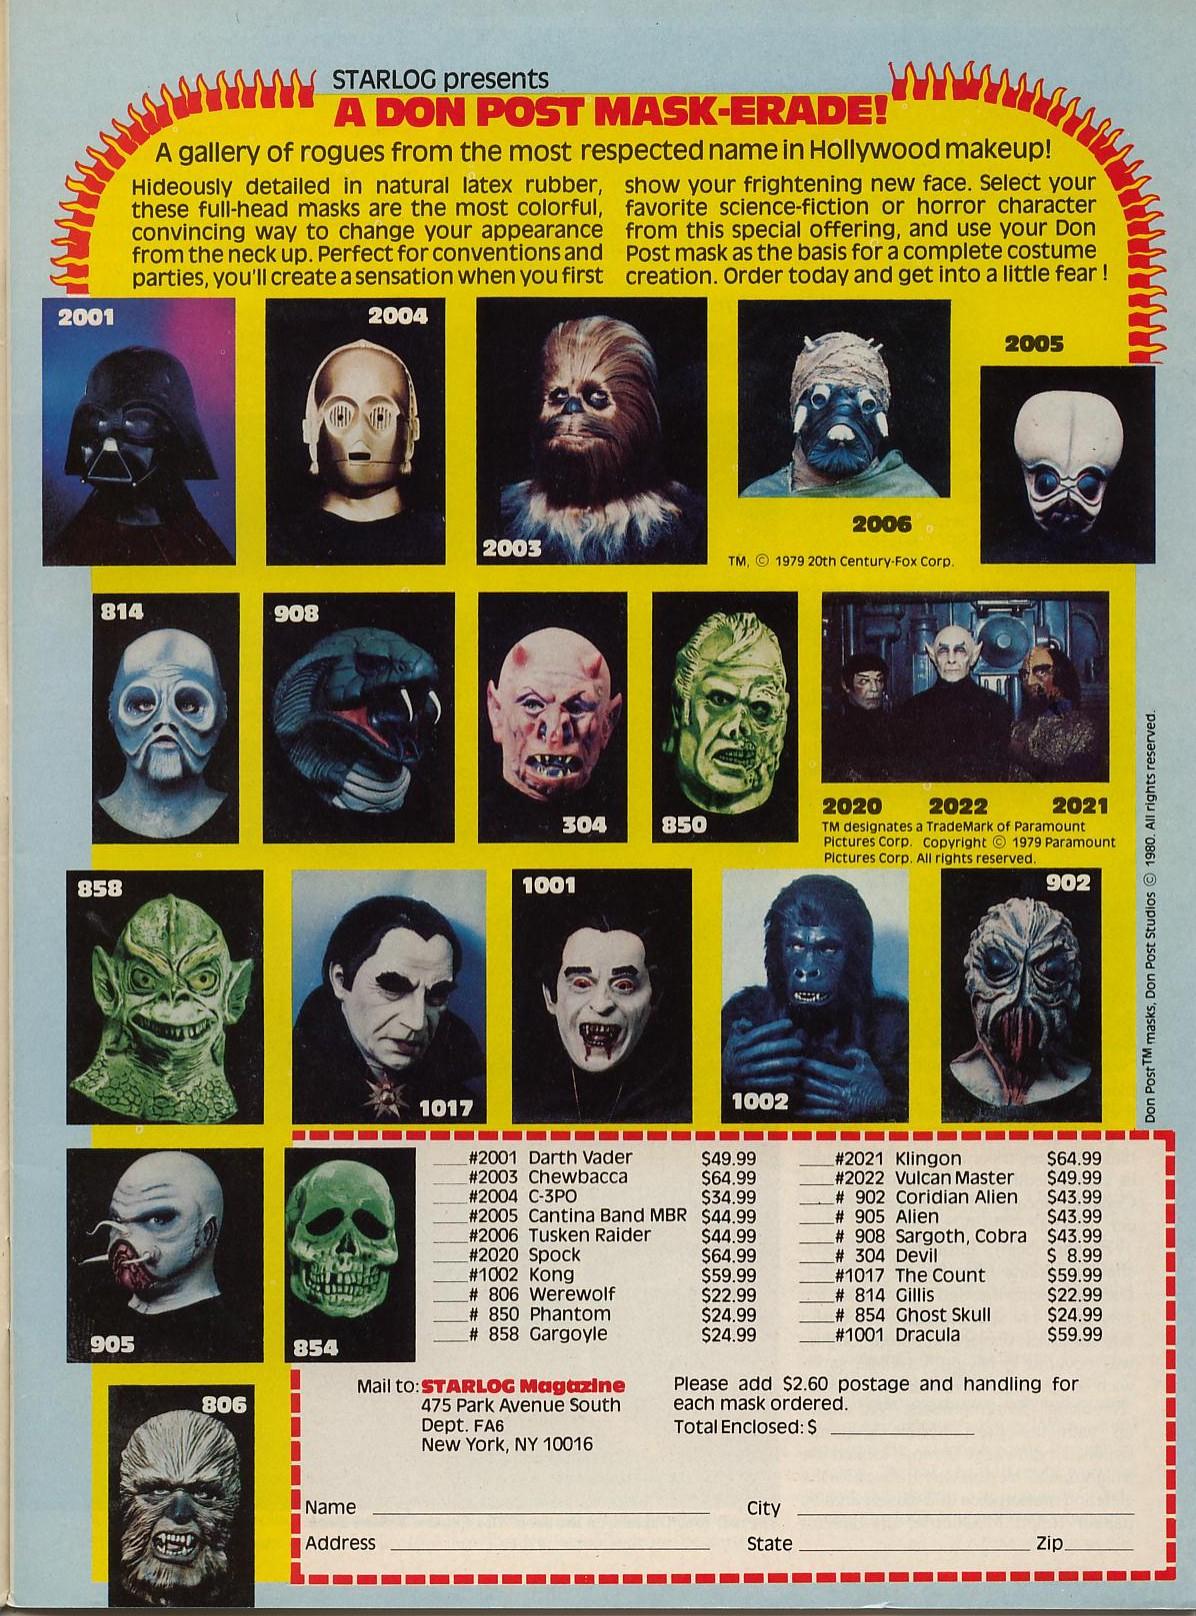 Don Post masks